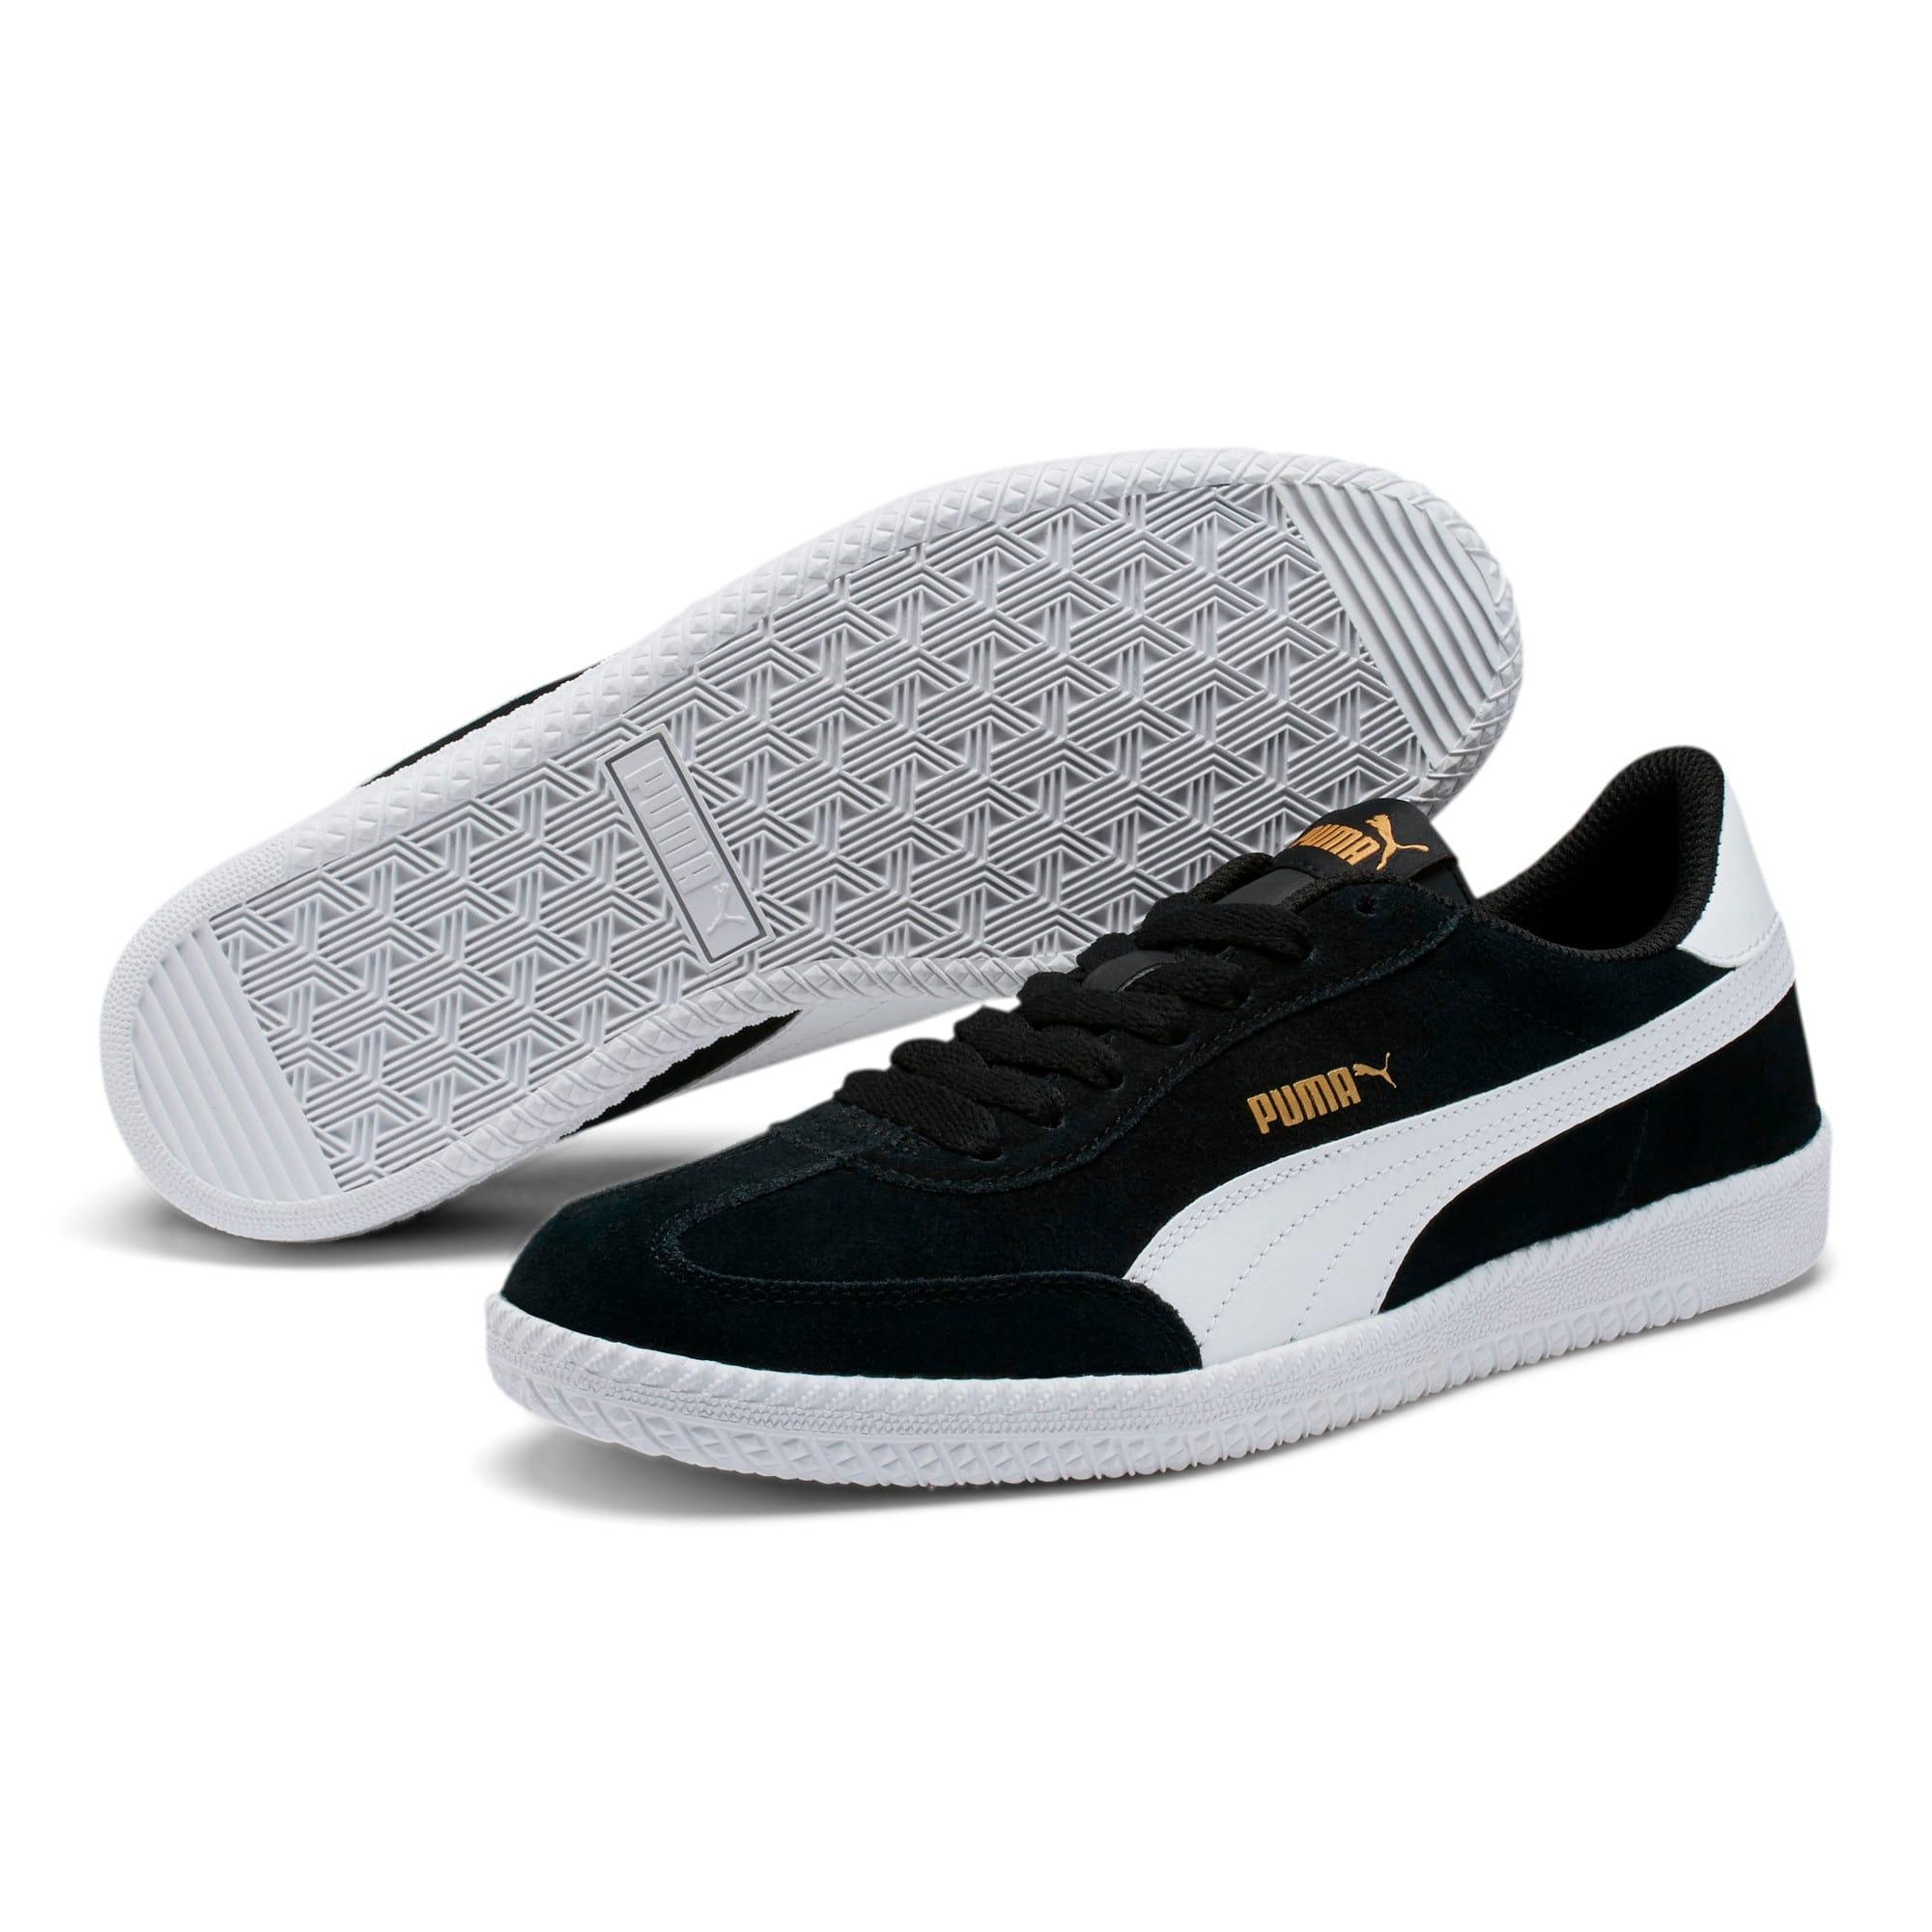 Thumbnail 2 of Astro Cup Suede Sneakers, Puma Black-Puma White, medium